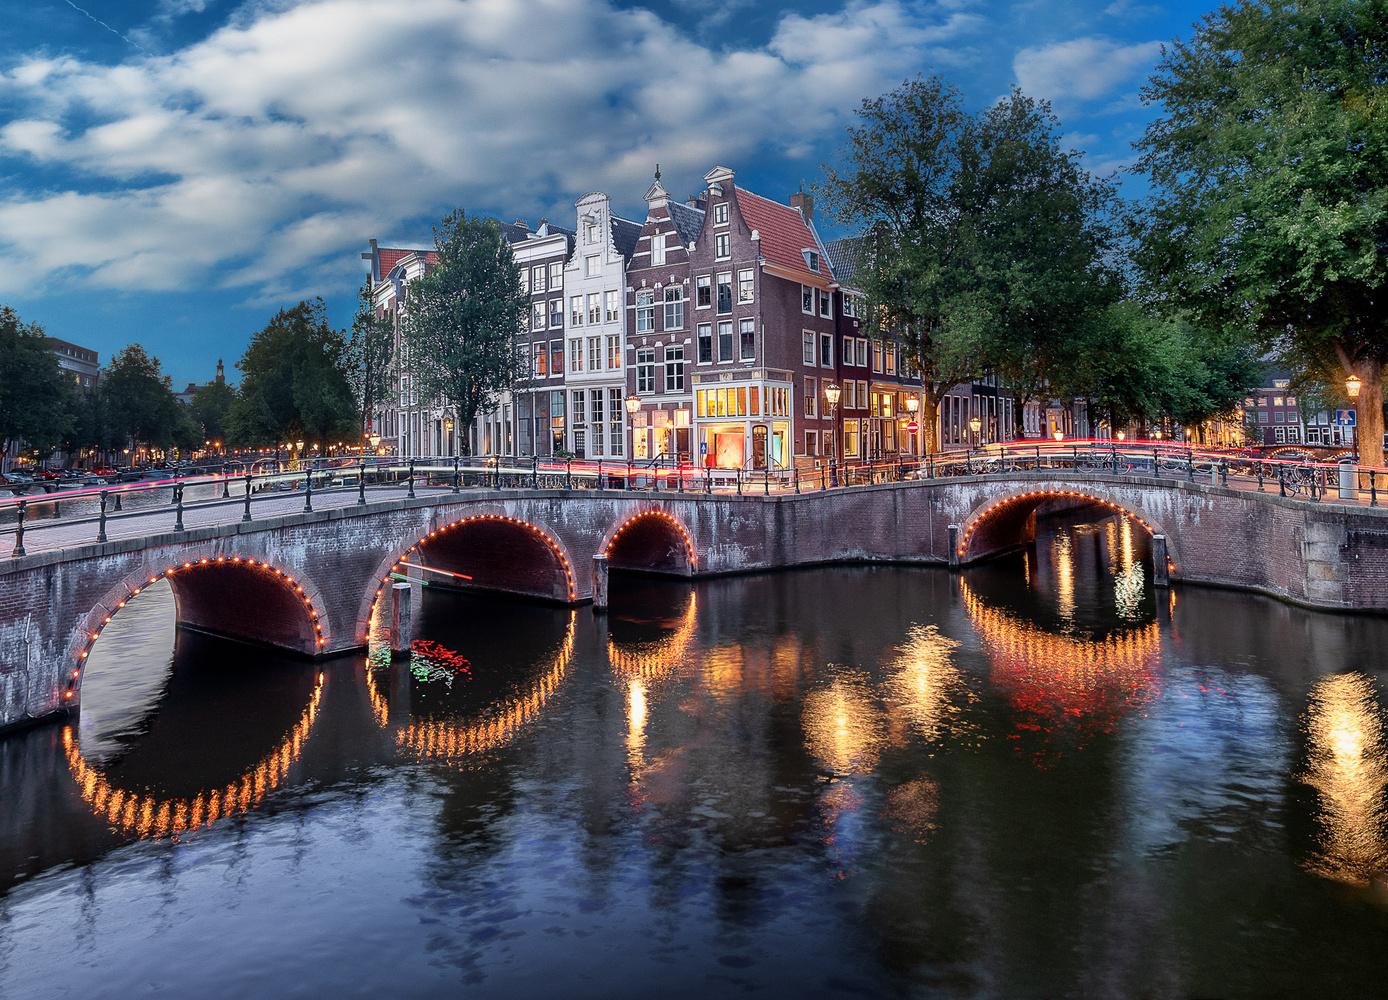 Amsterdam Keizersgracht by Thomas Schwinn